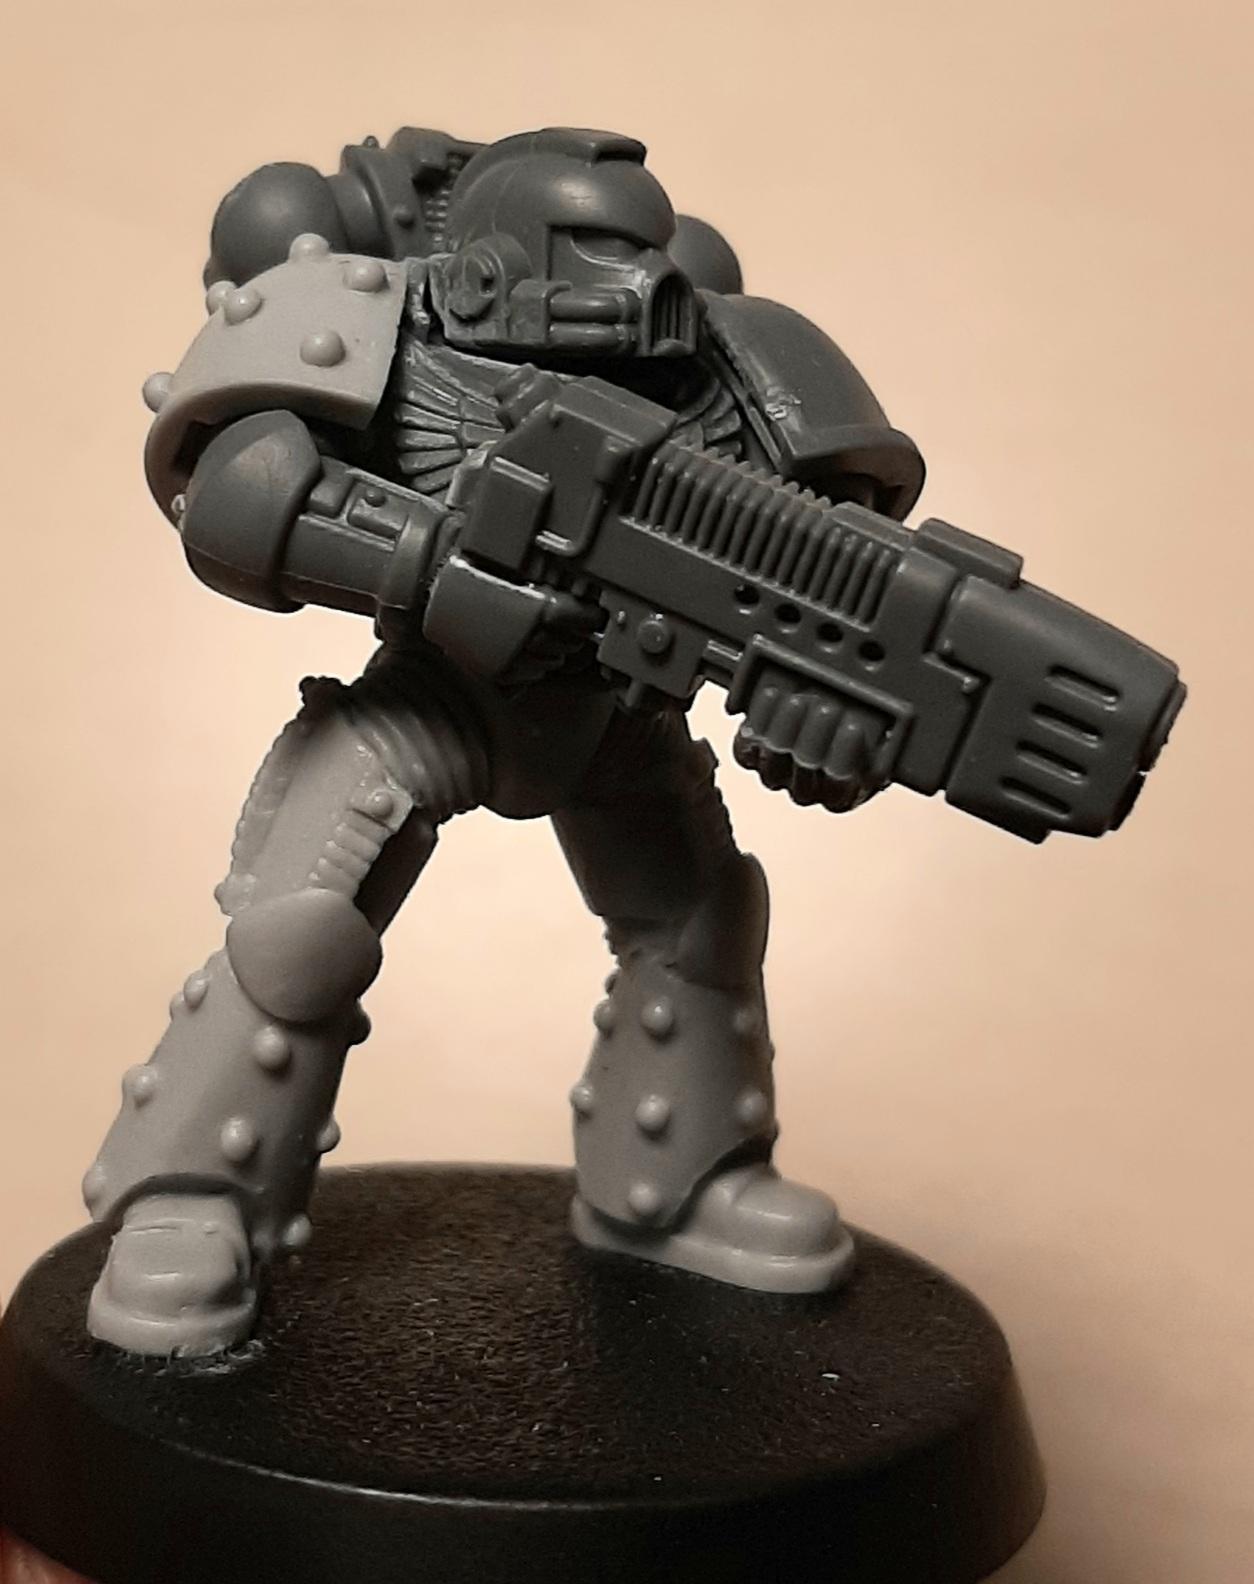 Abraxes, Dorn, Drinker, Free, Graevus, Iktinos, Luko, Lygris, Mutant, Mutated, Mutation, Pallas, Plasma, Renegade, Sarpedon, Soul, Space Marines, Tactical, Tellos, Traitor, Tzeentch